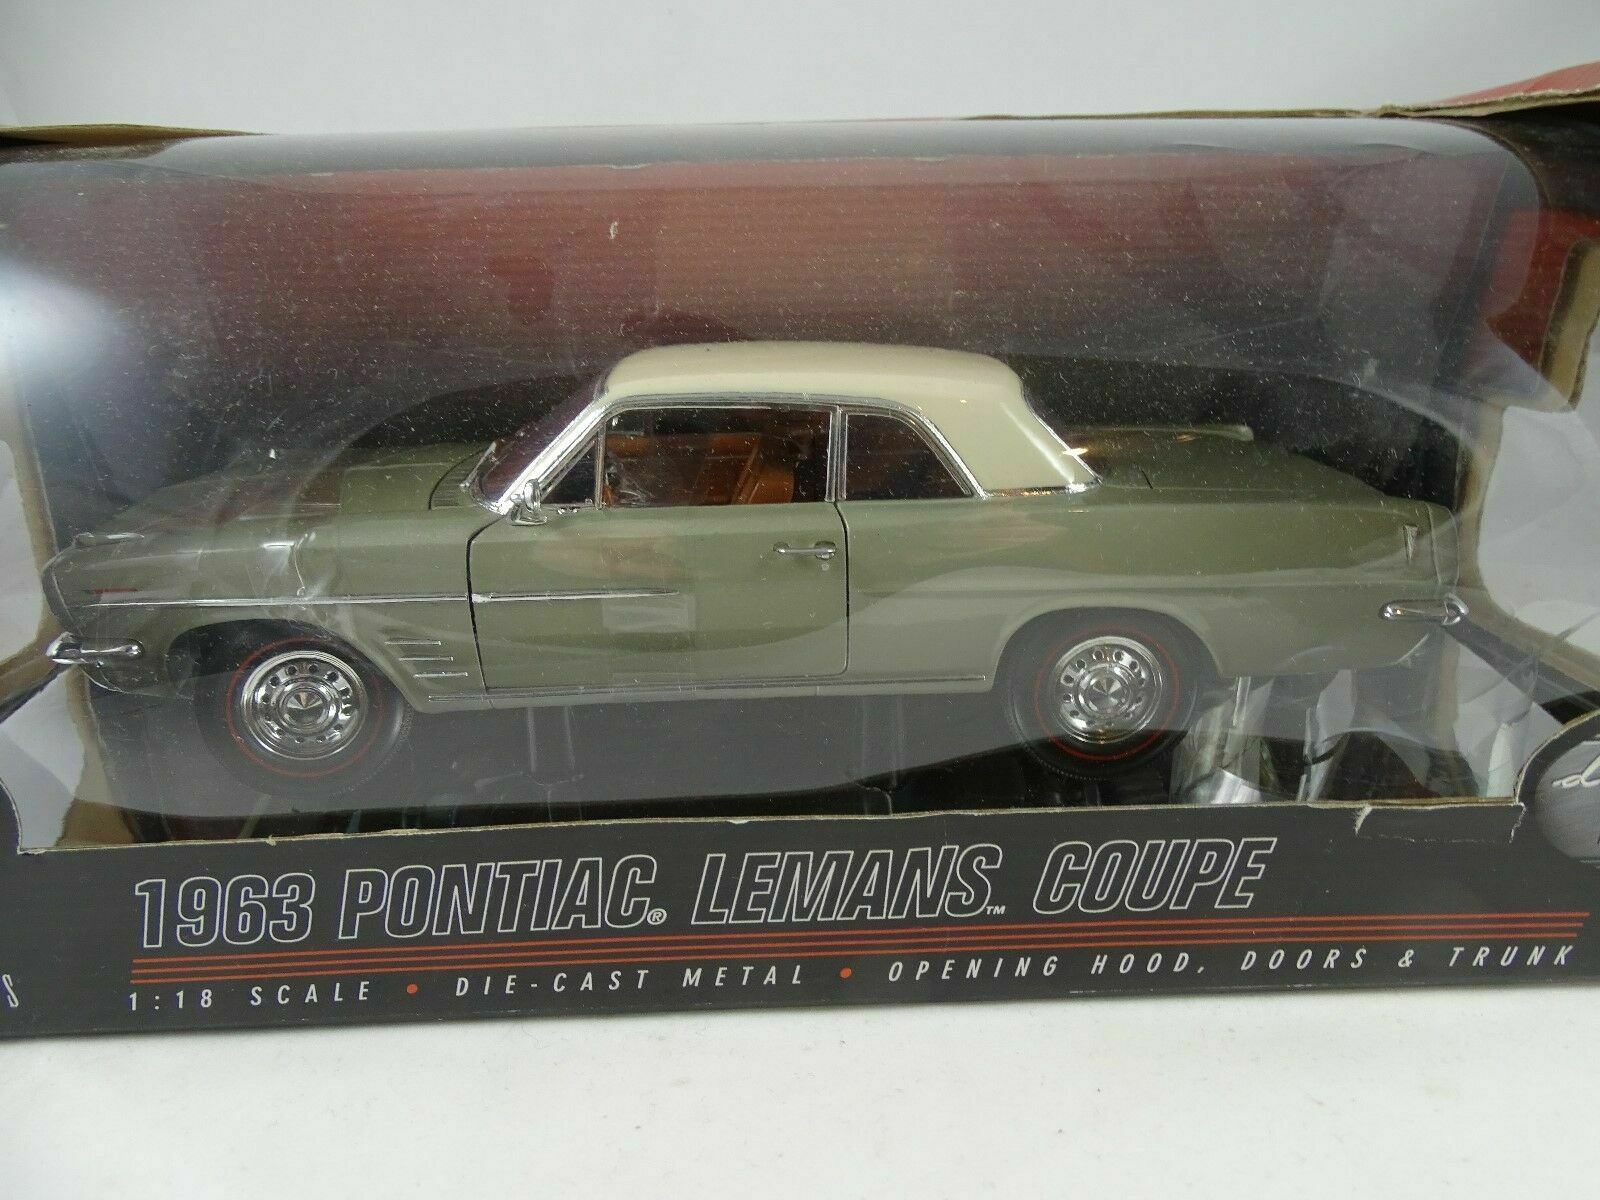 1 18 Highway 61  50145 - 1963 Pontiac Lemans-Nuovo Scatola Originale